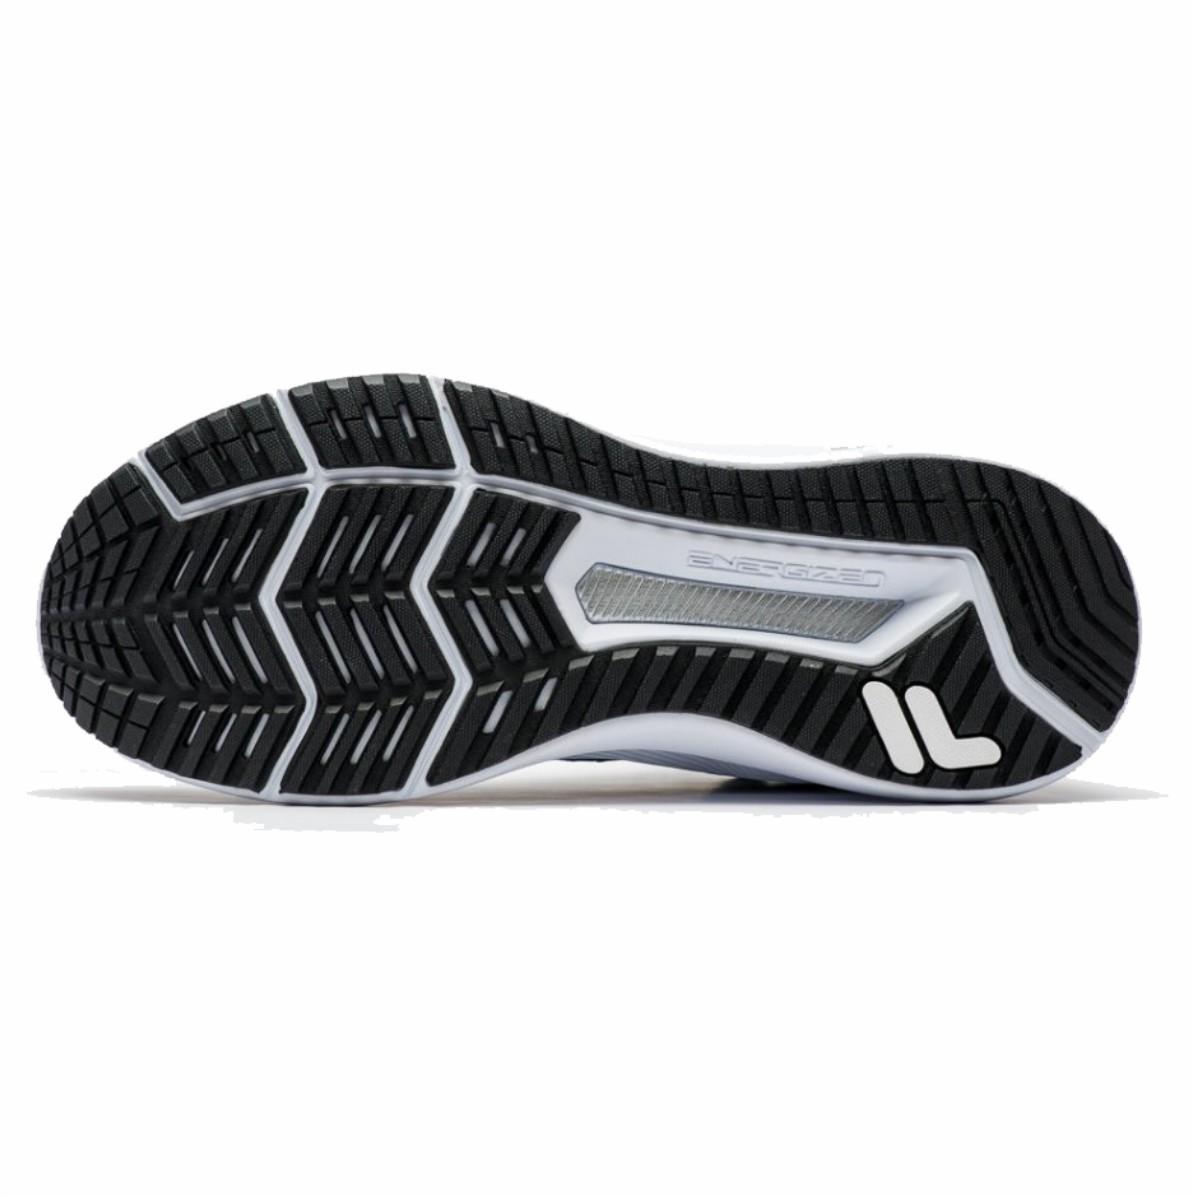 Tenis Fila Racer Knit Energized Masculino Running Training Preto